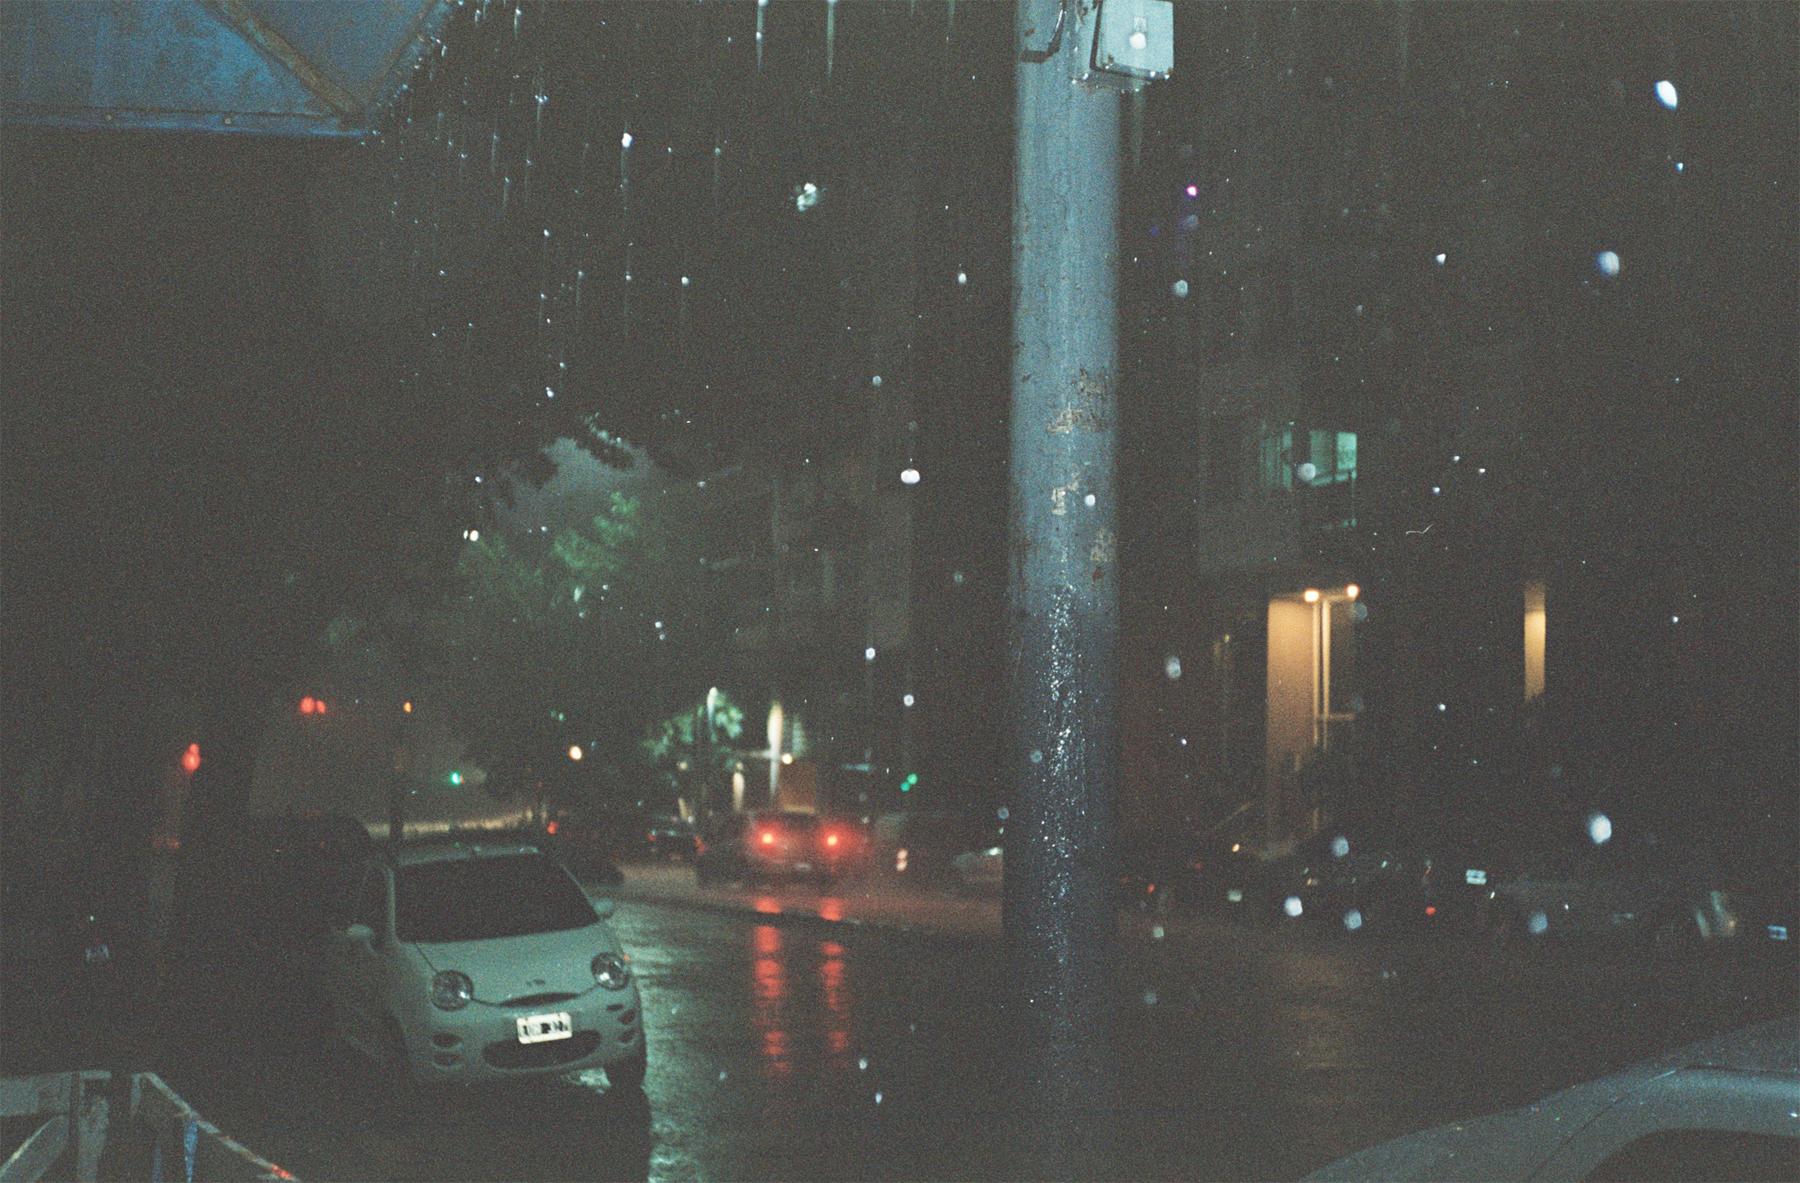 One Night in Buenos Aires | Zenit E w. Helios 44 | Dan Fernandez